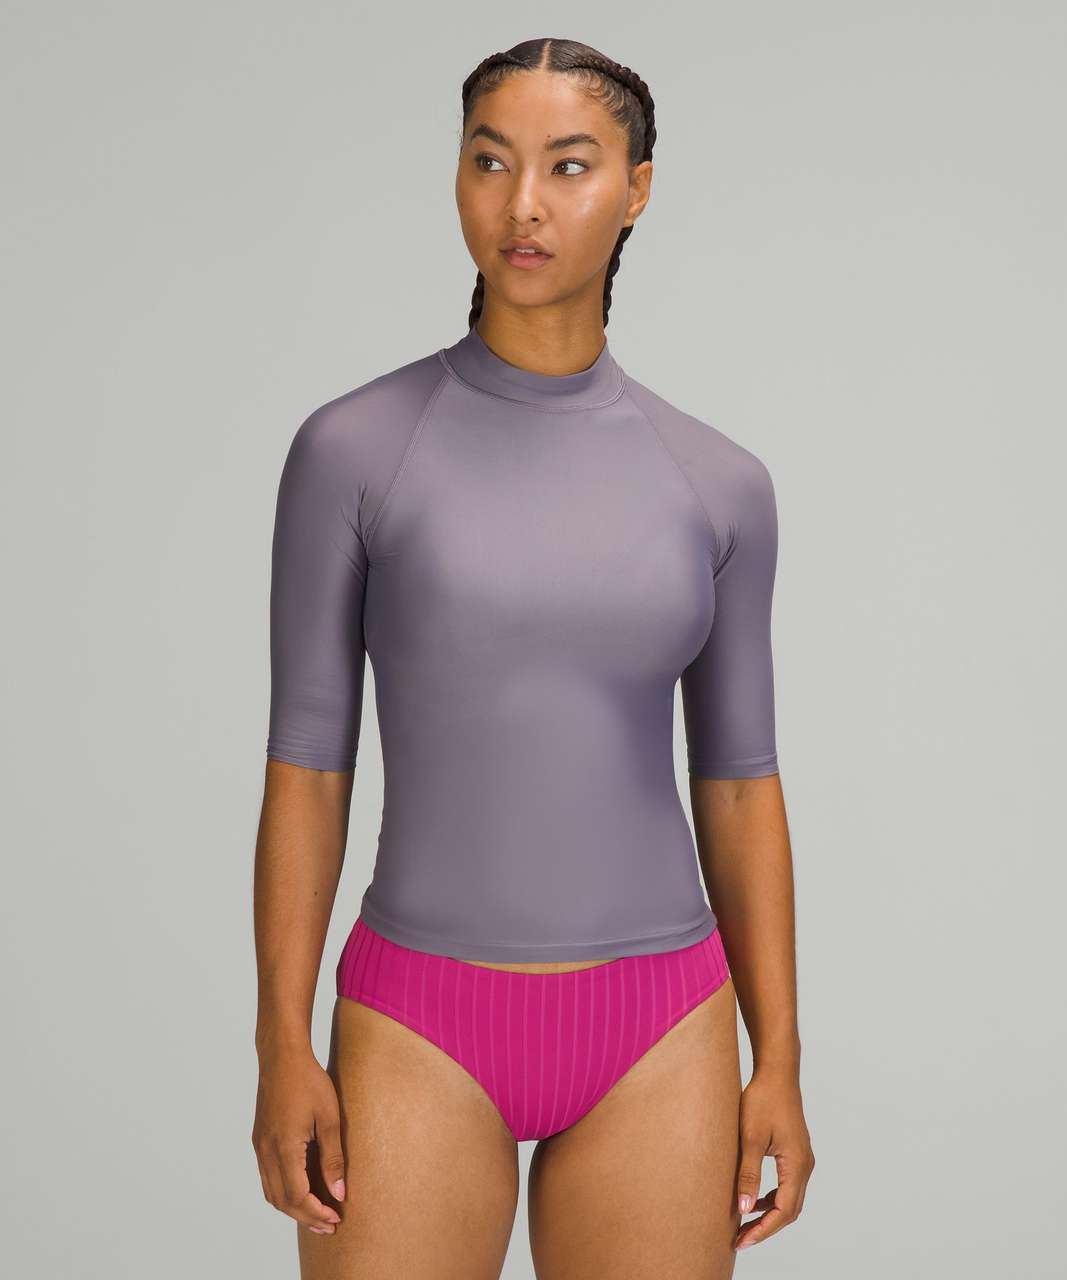 Lululemon Waterside UV Protection Short-Sleeve Rash Guard - Dusky Lavender